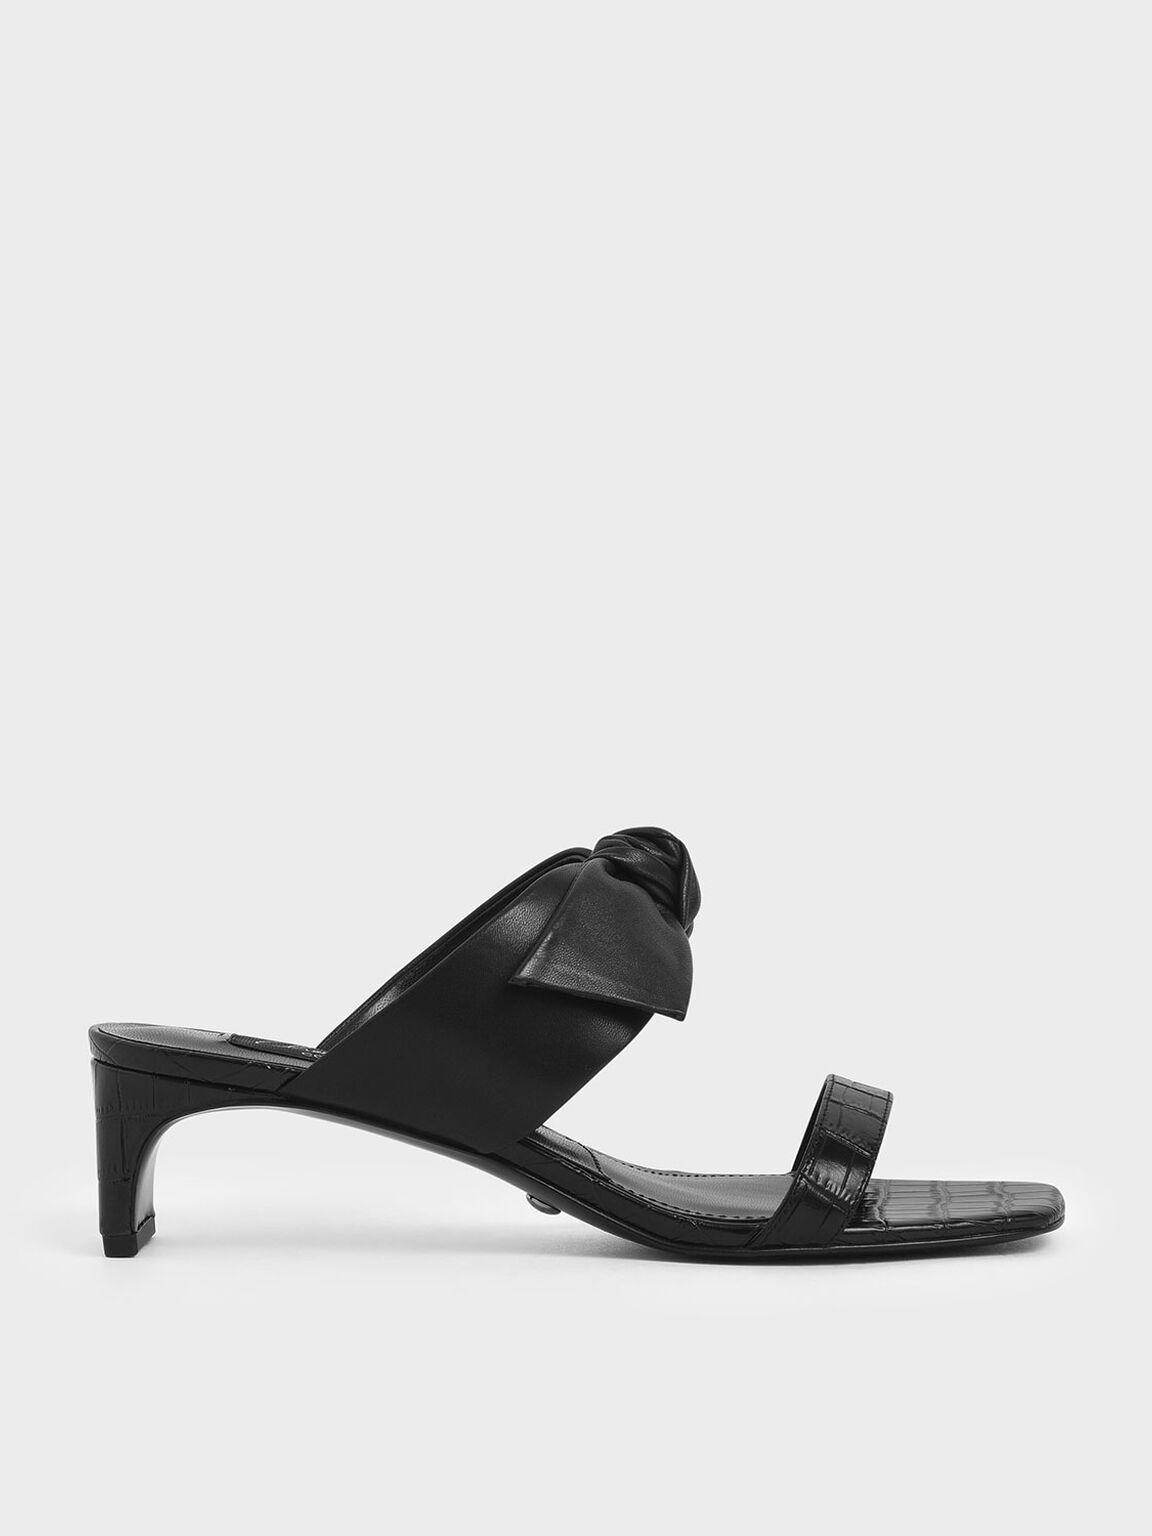 Croc-Effect Bow Leather Mules, Black, hi-res